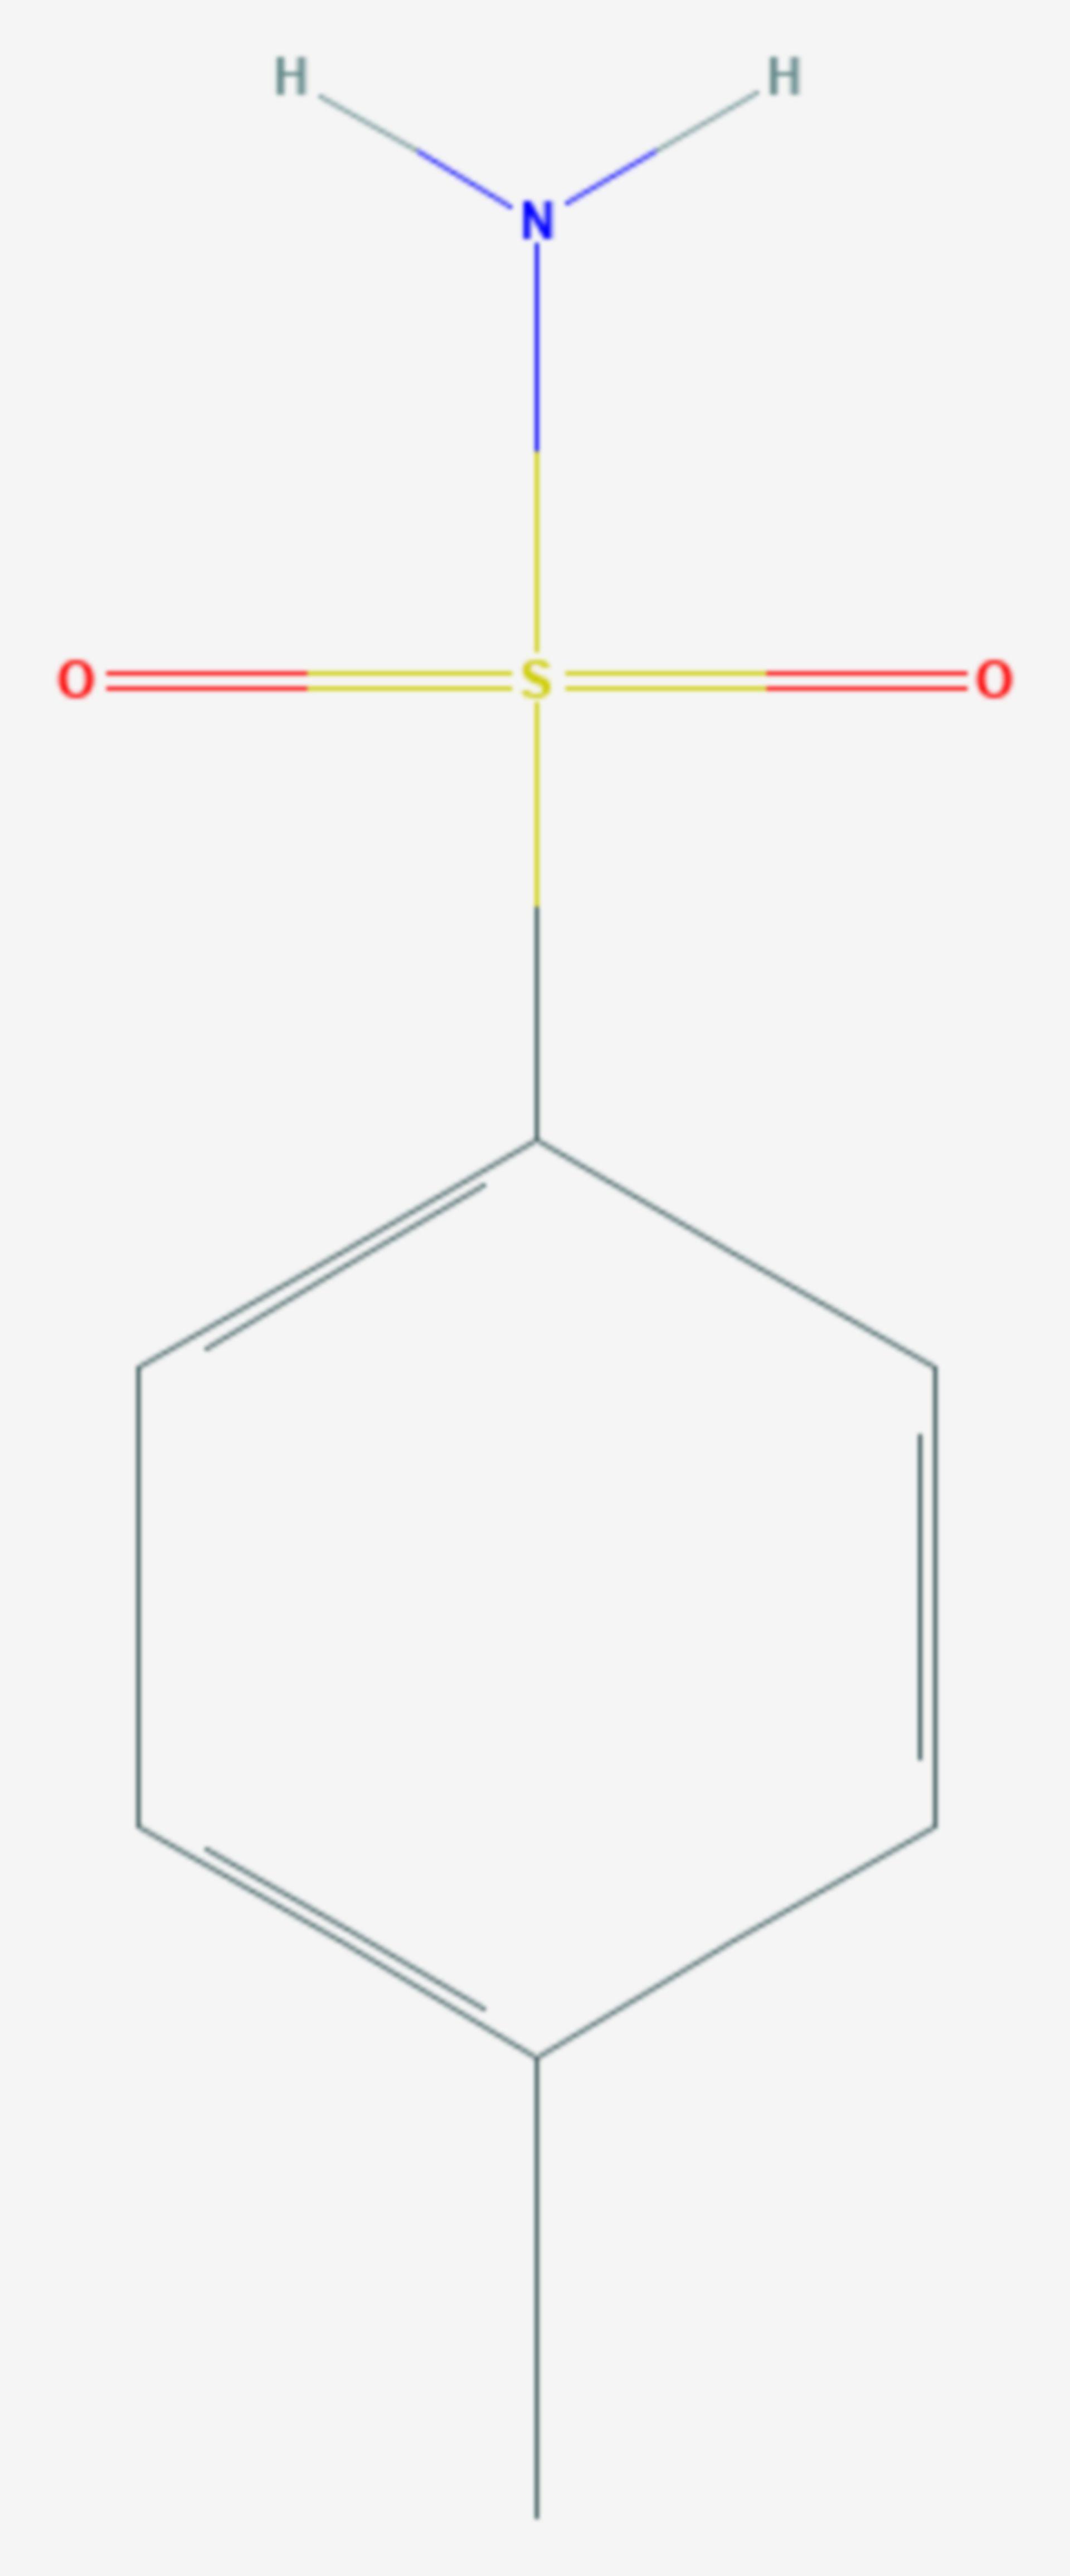 P-Toluolsulfonamid (Strukturformel)